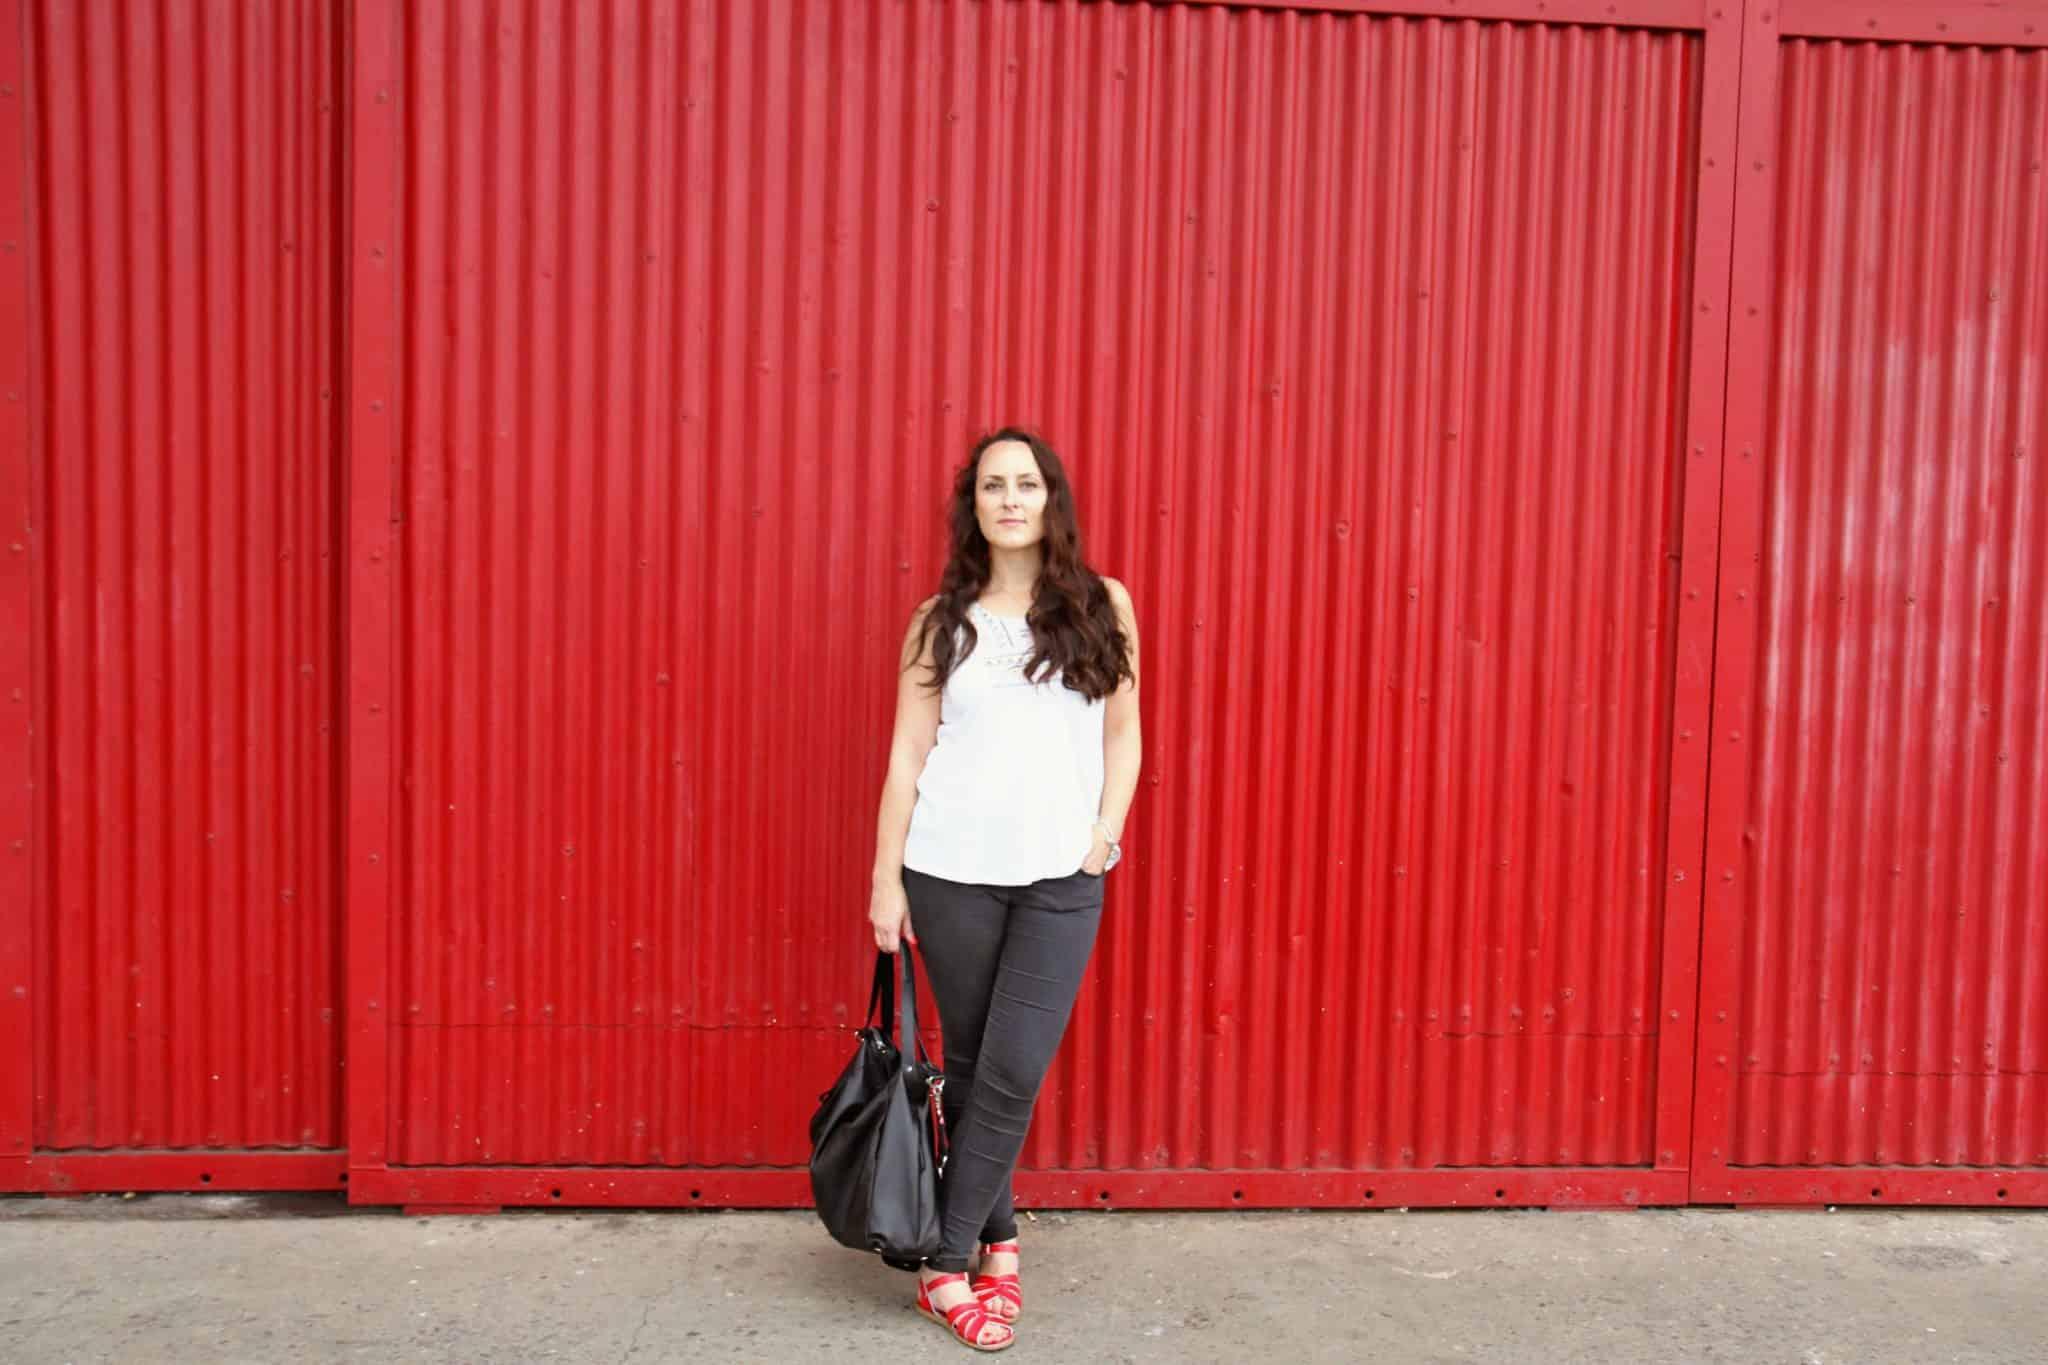 Wearing black topshop jeans, red saltwater sandals and Storksak Catherine bag in black